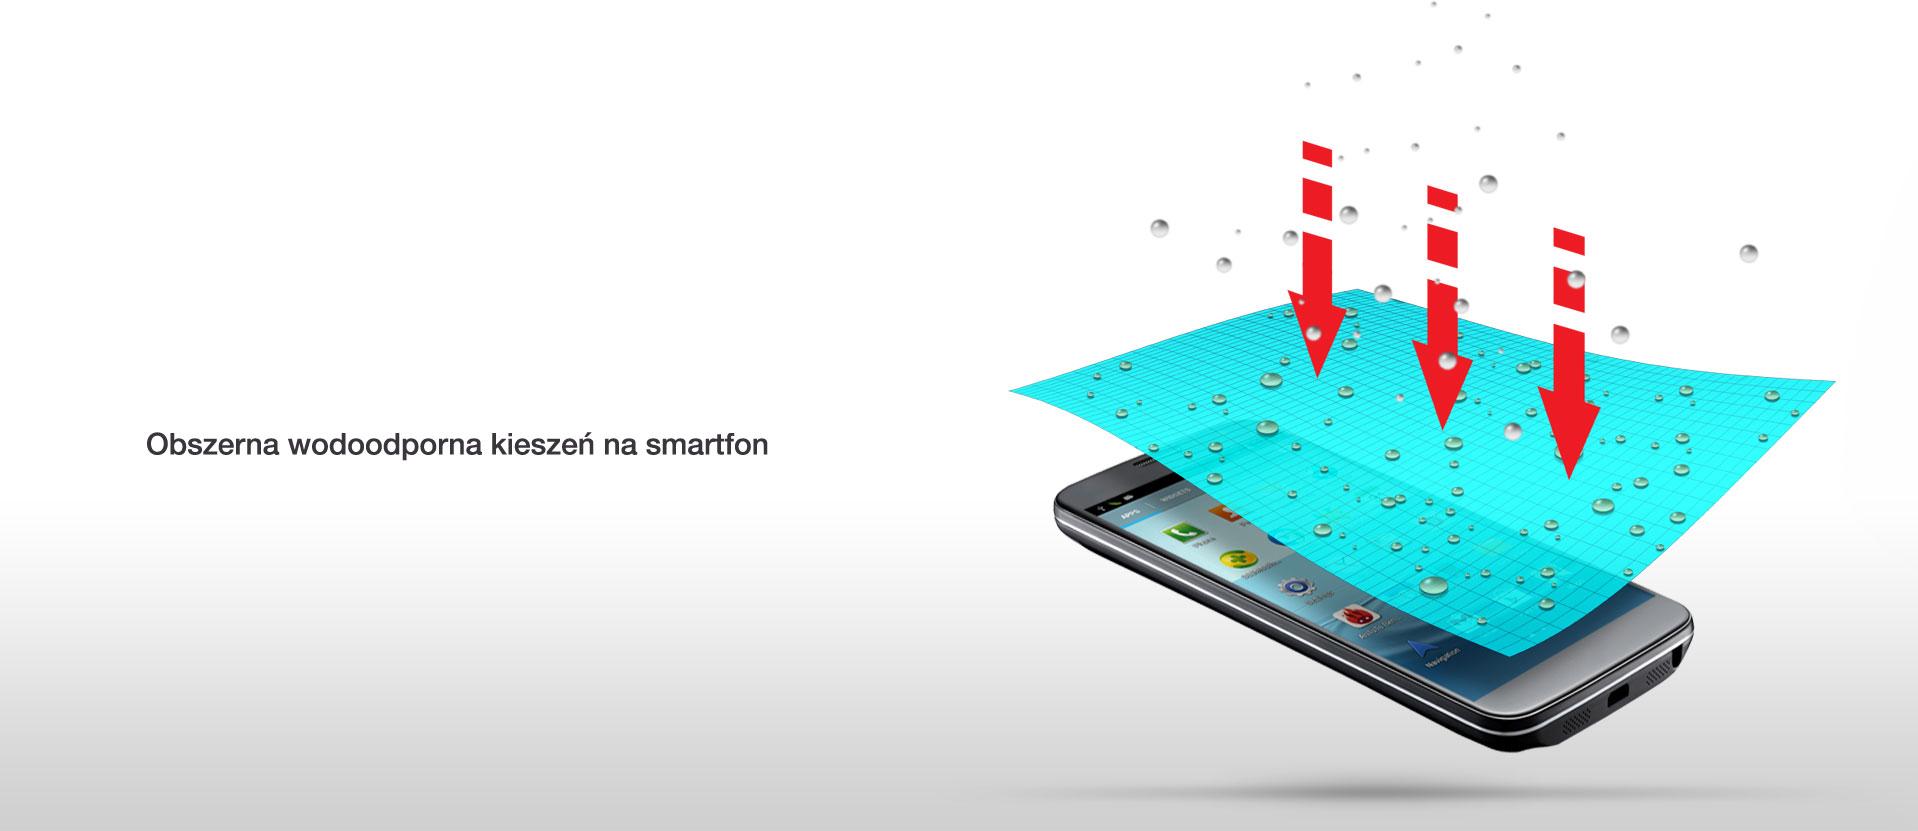 Obszerna wodoodporna kieszeń na smartfon.